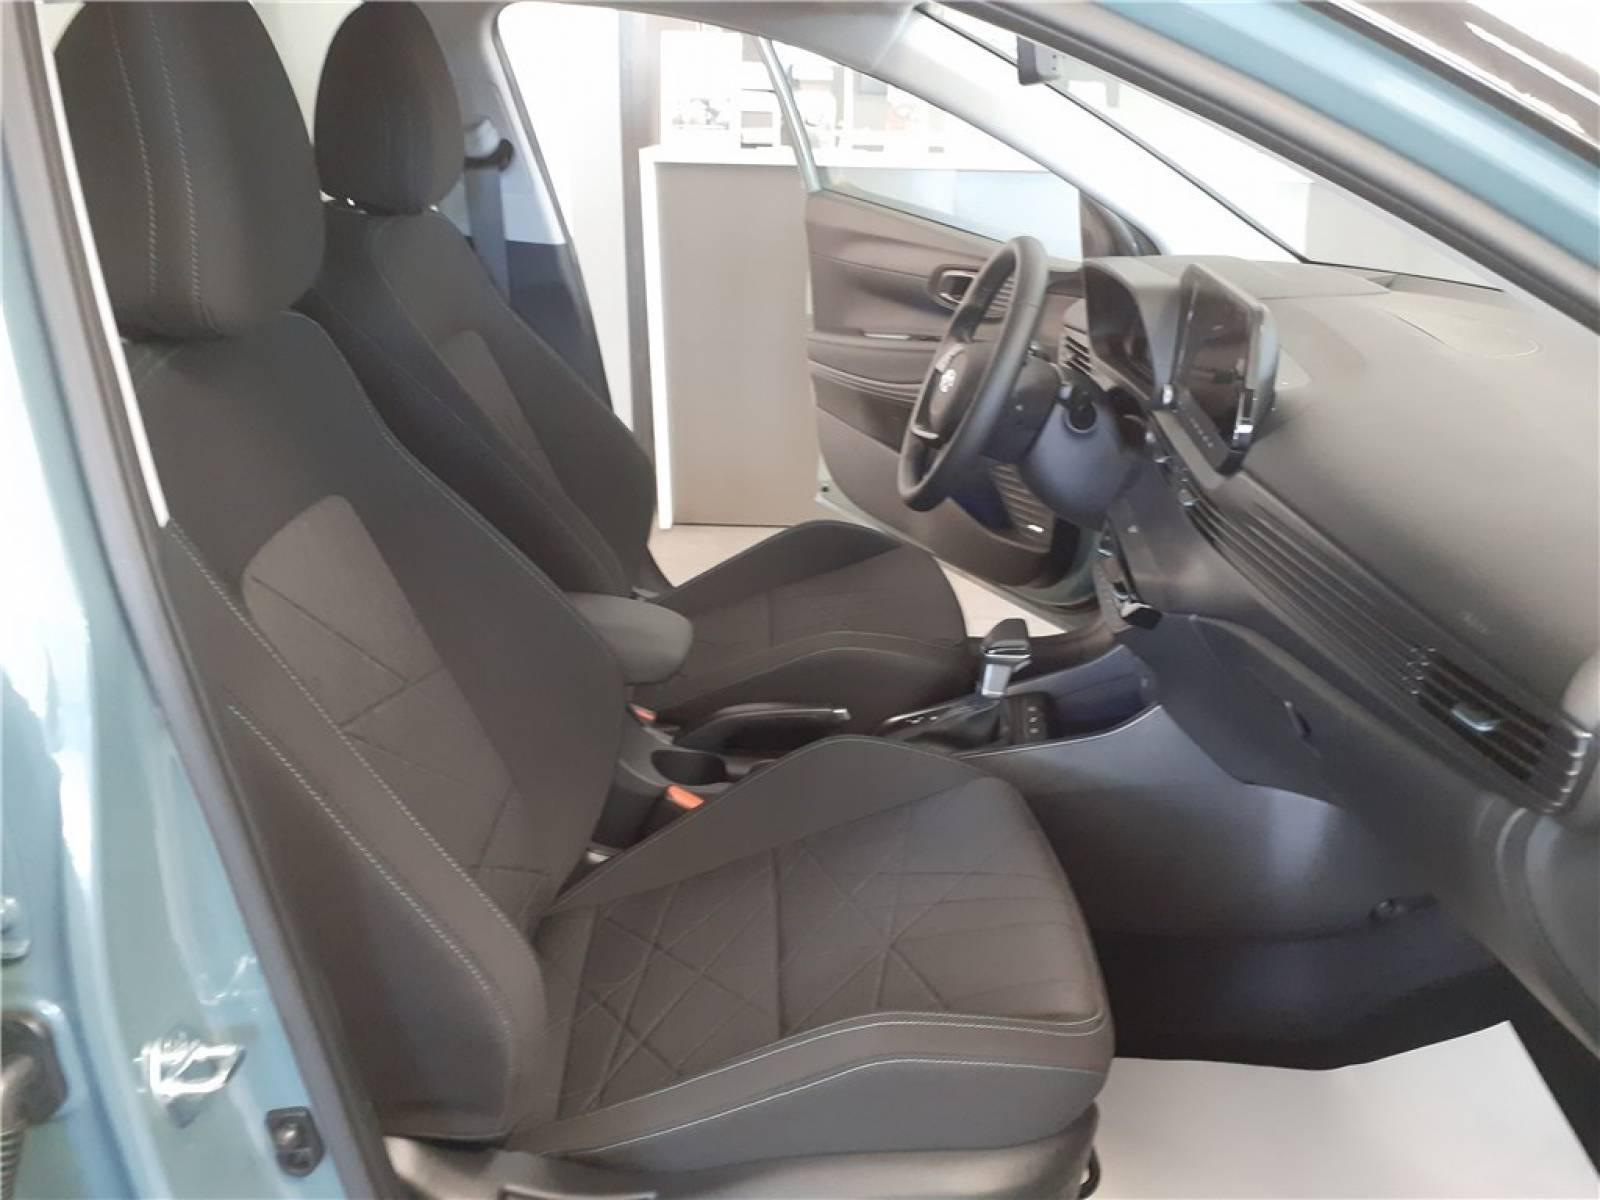 HYUNDAI Bayon 1.0 T-GDi 100 DCT-7 Hybrid 48V - véhicule d'occasion - Groupe Guillet - Chalon Automobiles - 71100 - Chalon-sur-Saône - 44